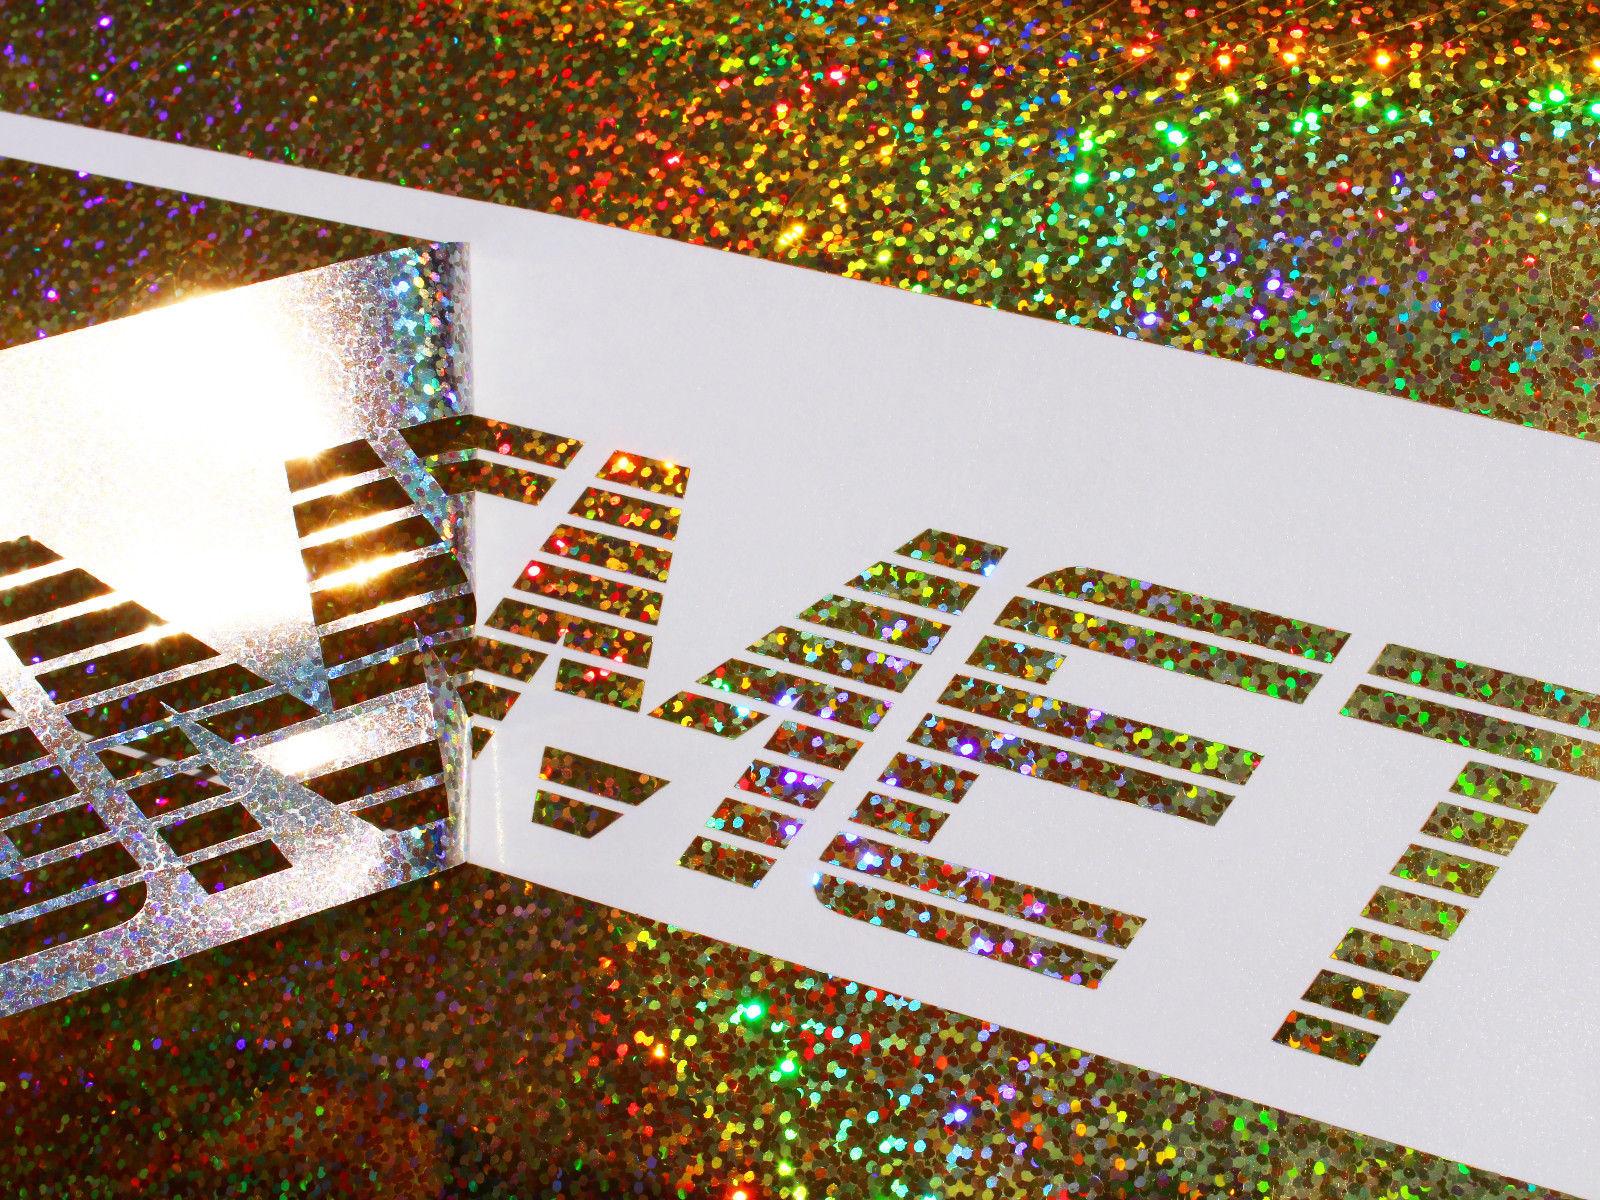 19-49-26-20-m-Plotterfolie-Hologramm-Oilslick-Folie-Aufkleber-Plottfolie Indexbild 26